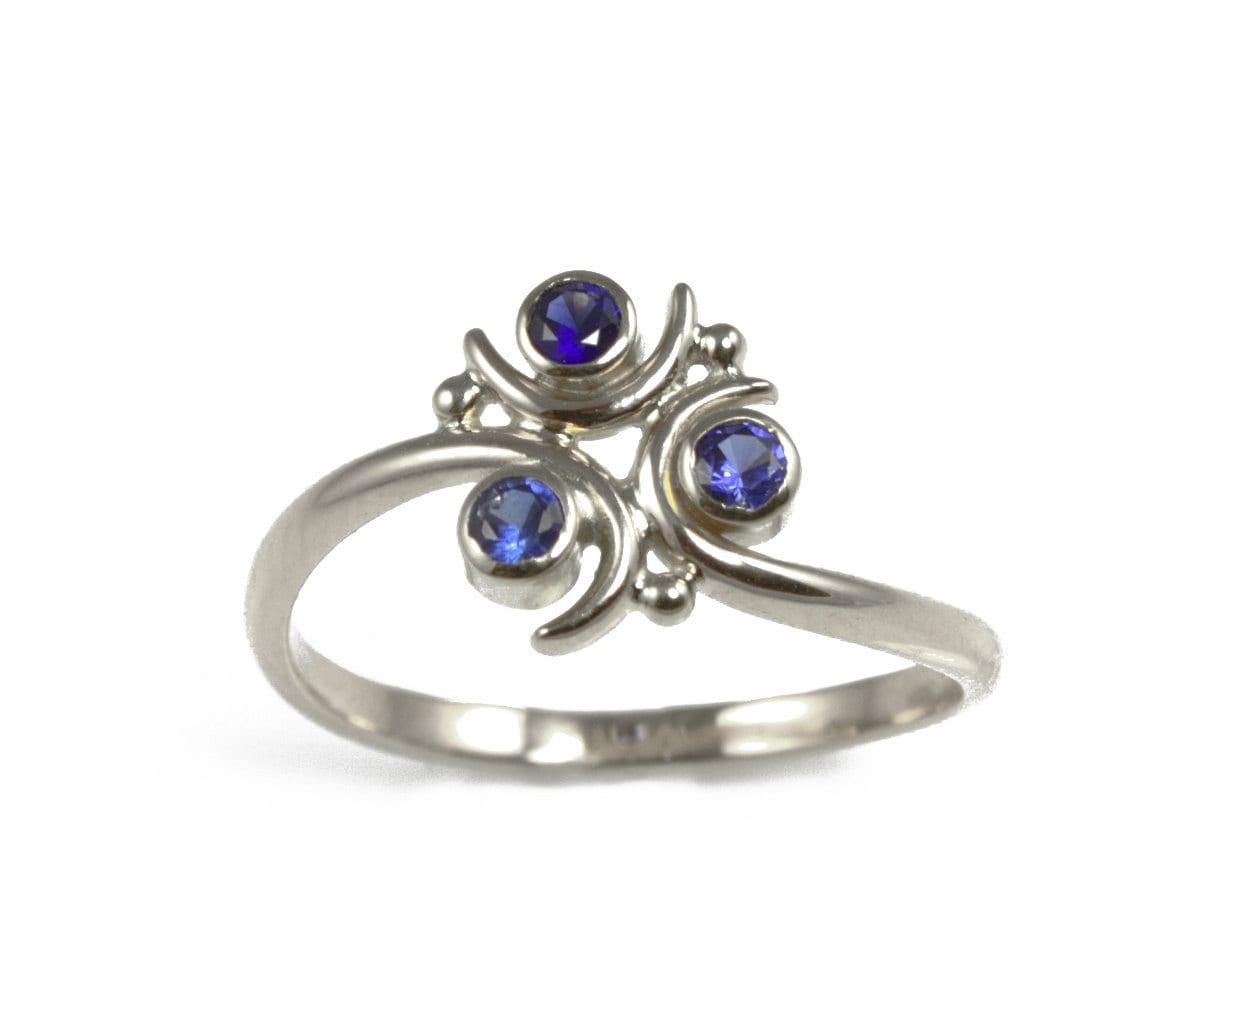 Zora Sapphire Ring Silver Geeky Ring Legend of Zelda